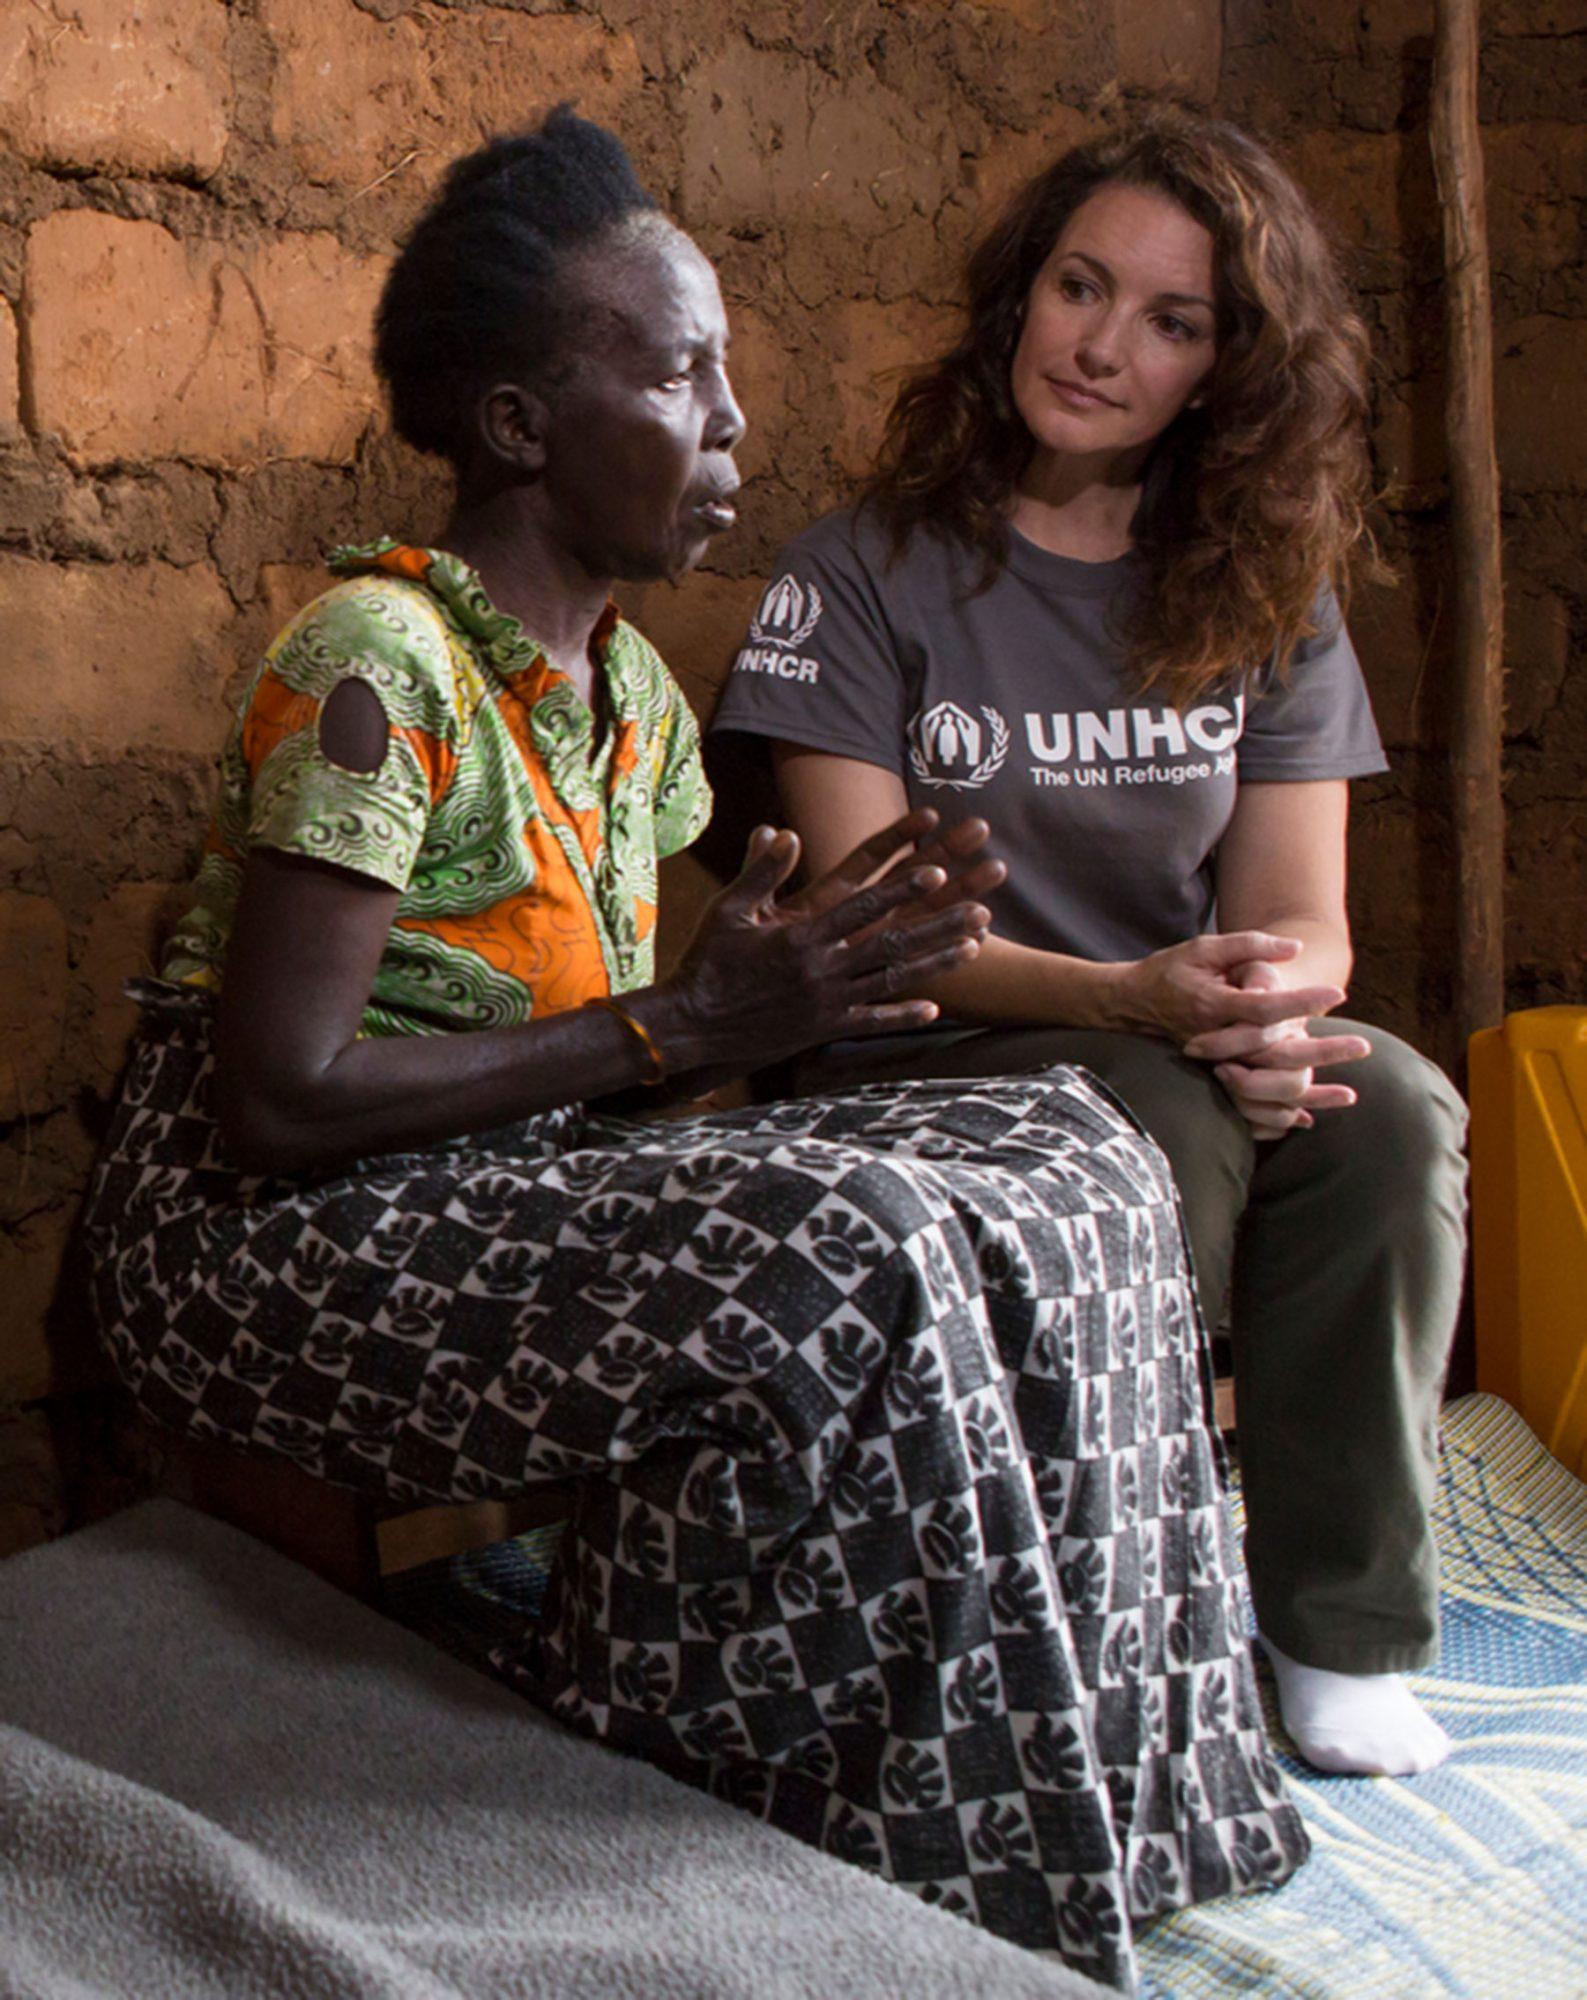 Rwanda. UNHCR Goodwill Ambassador Kristin Davis meets Marie Therese